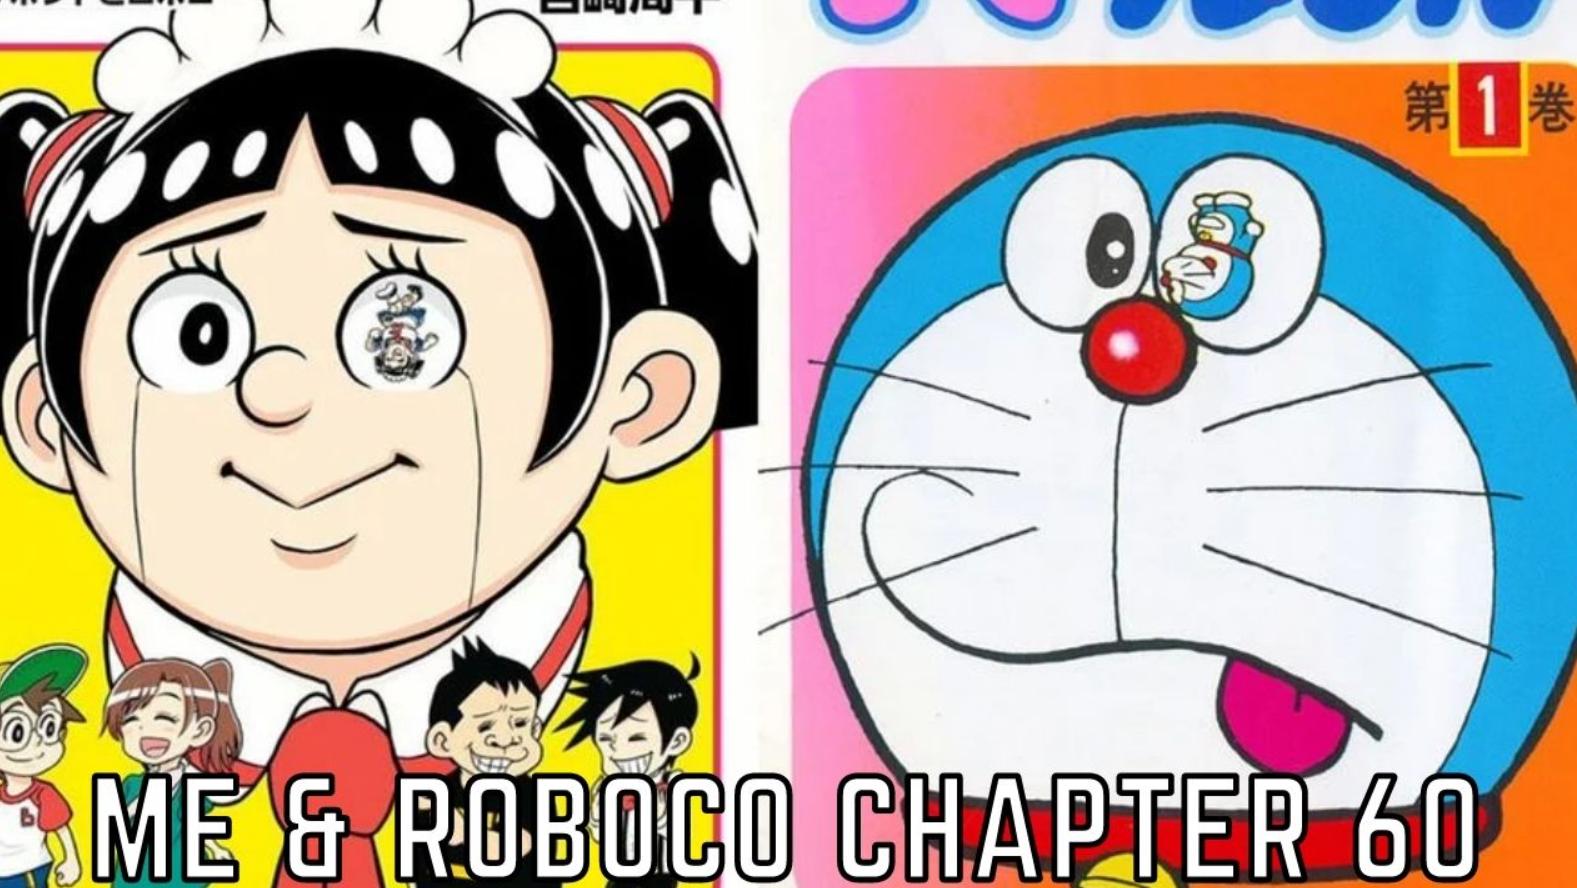 me & roboco chapter 60